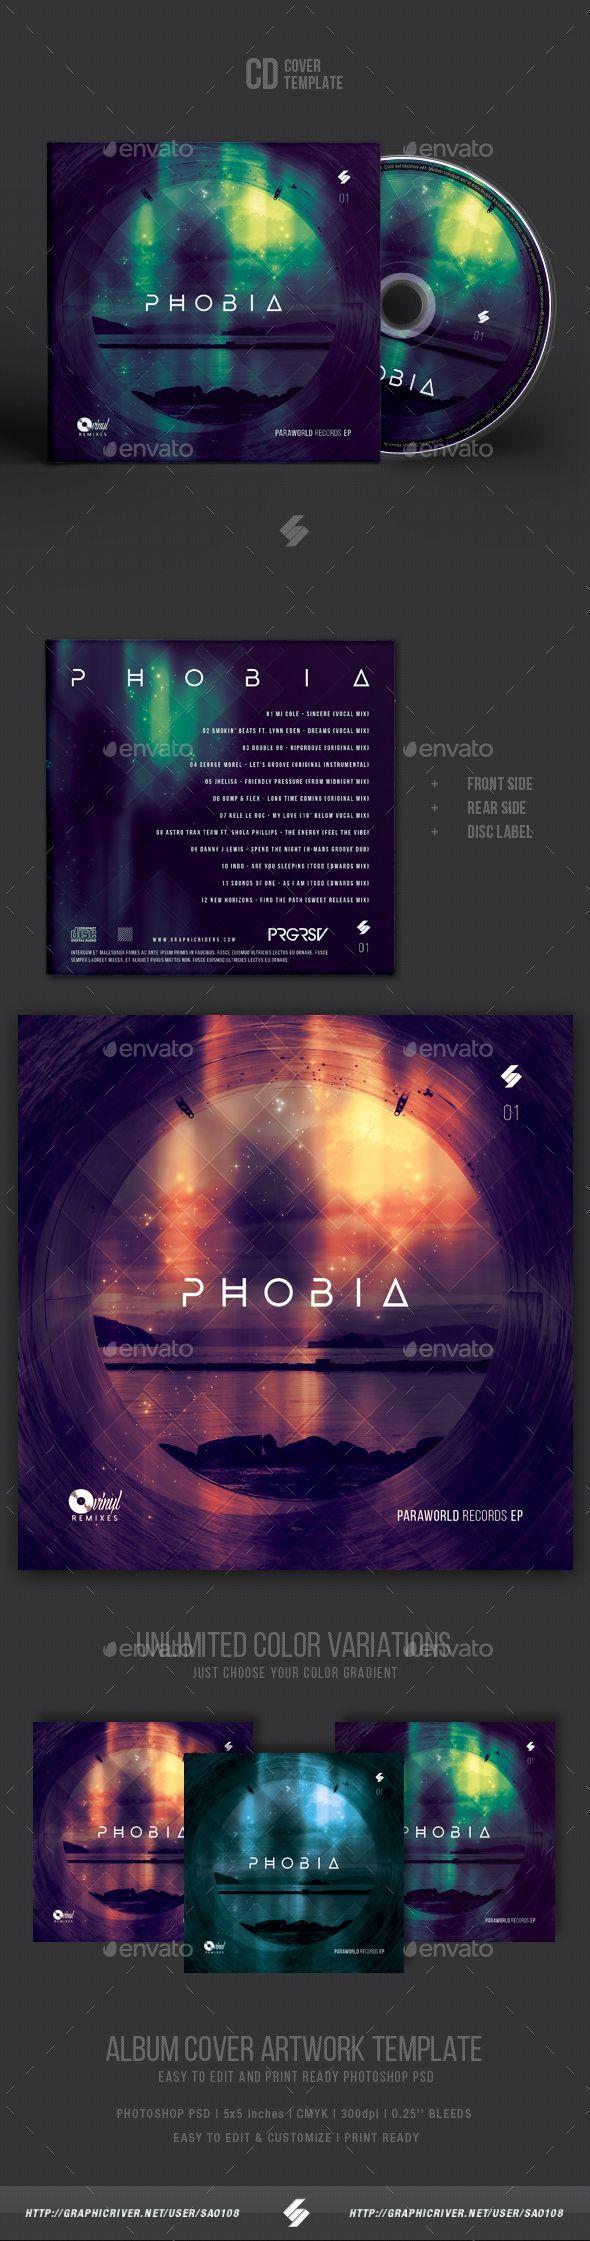 Phobia - Progressive Sound CD Cover Template PSD